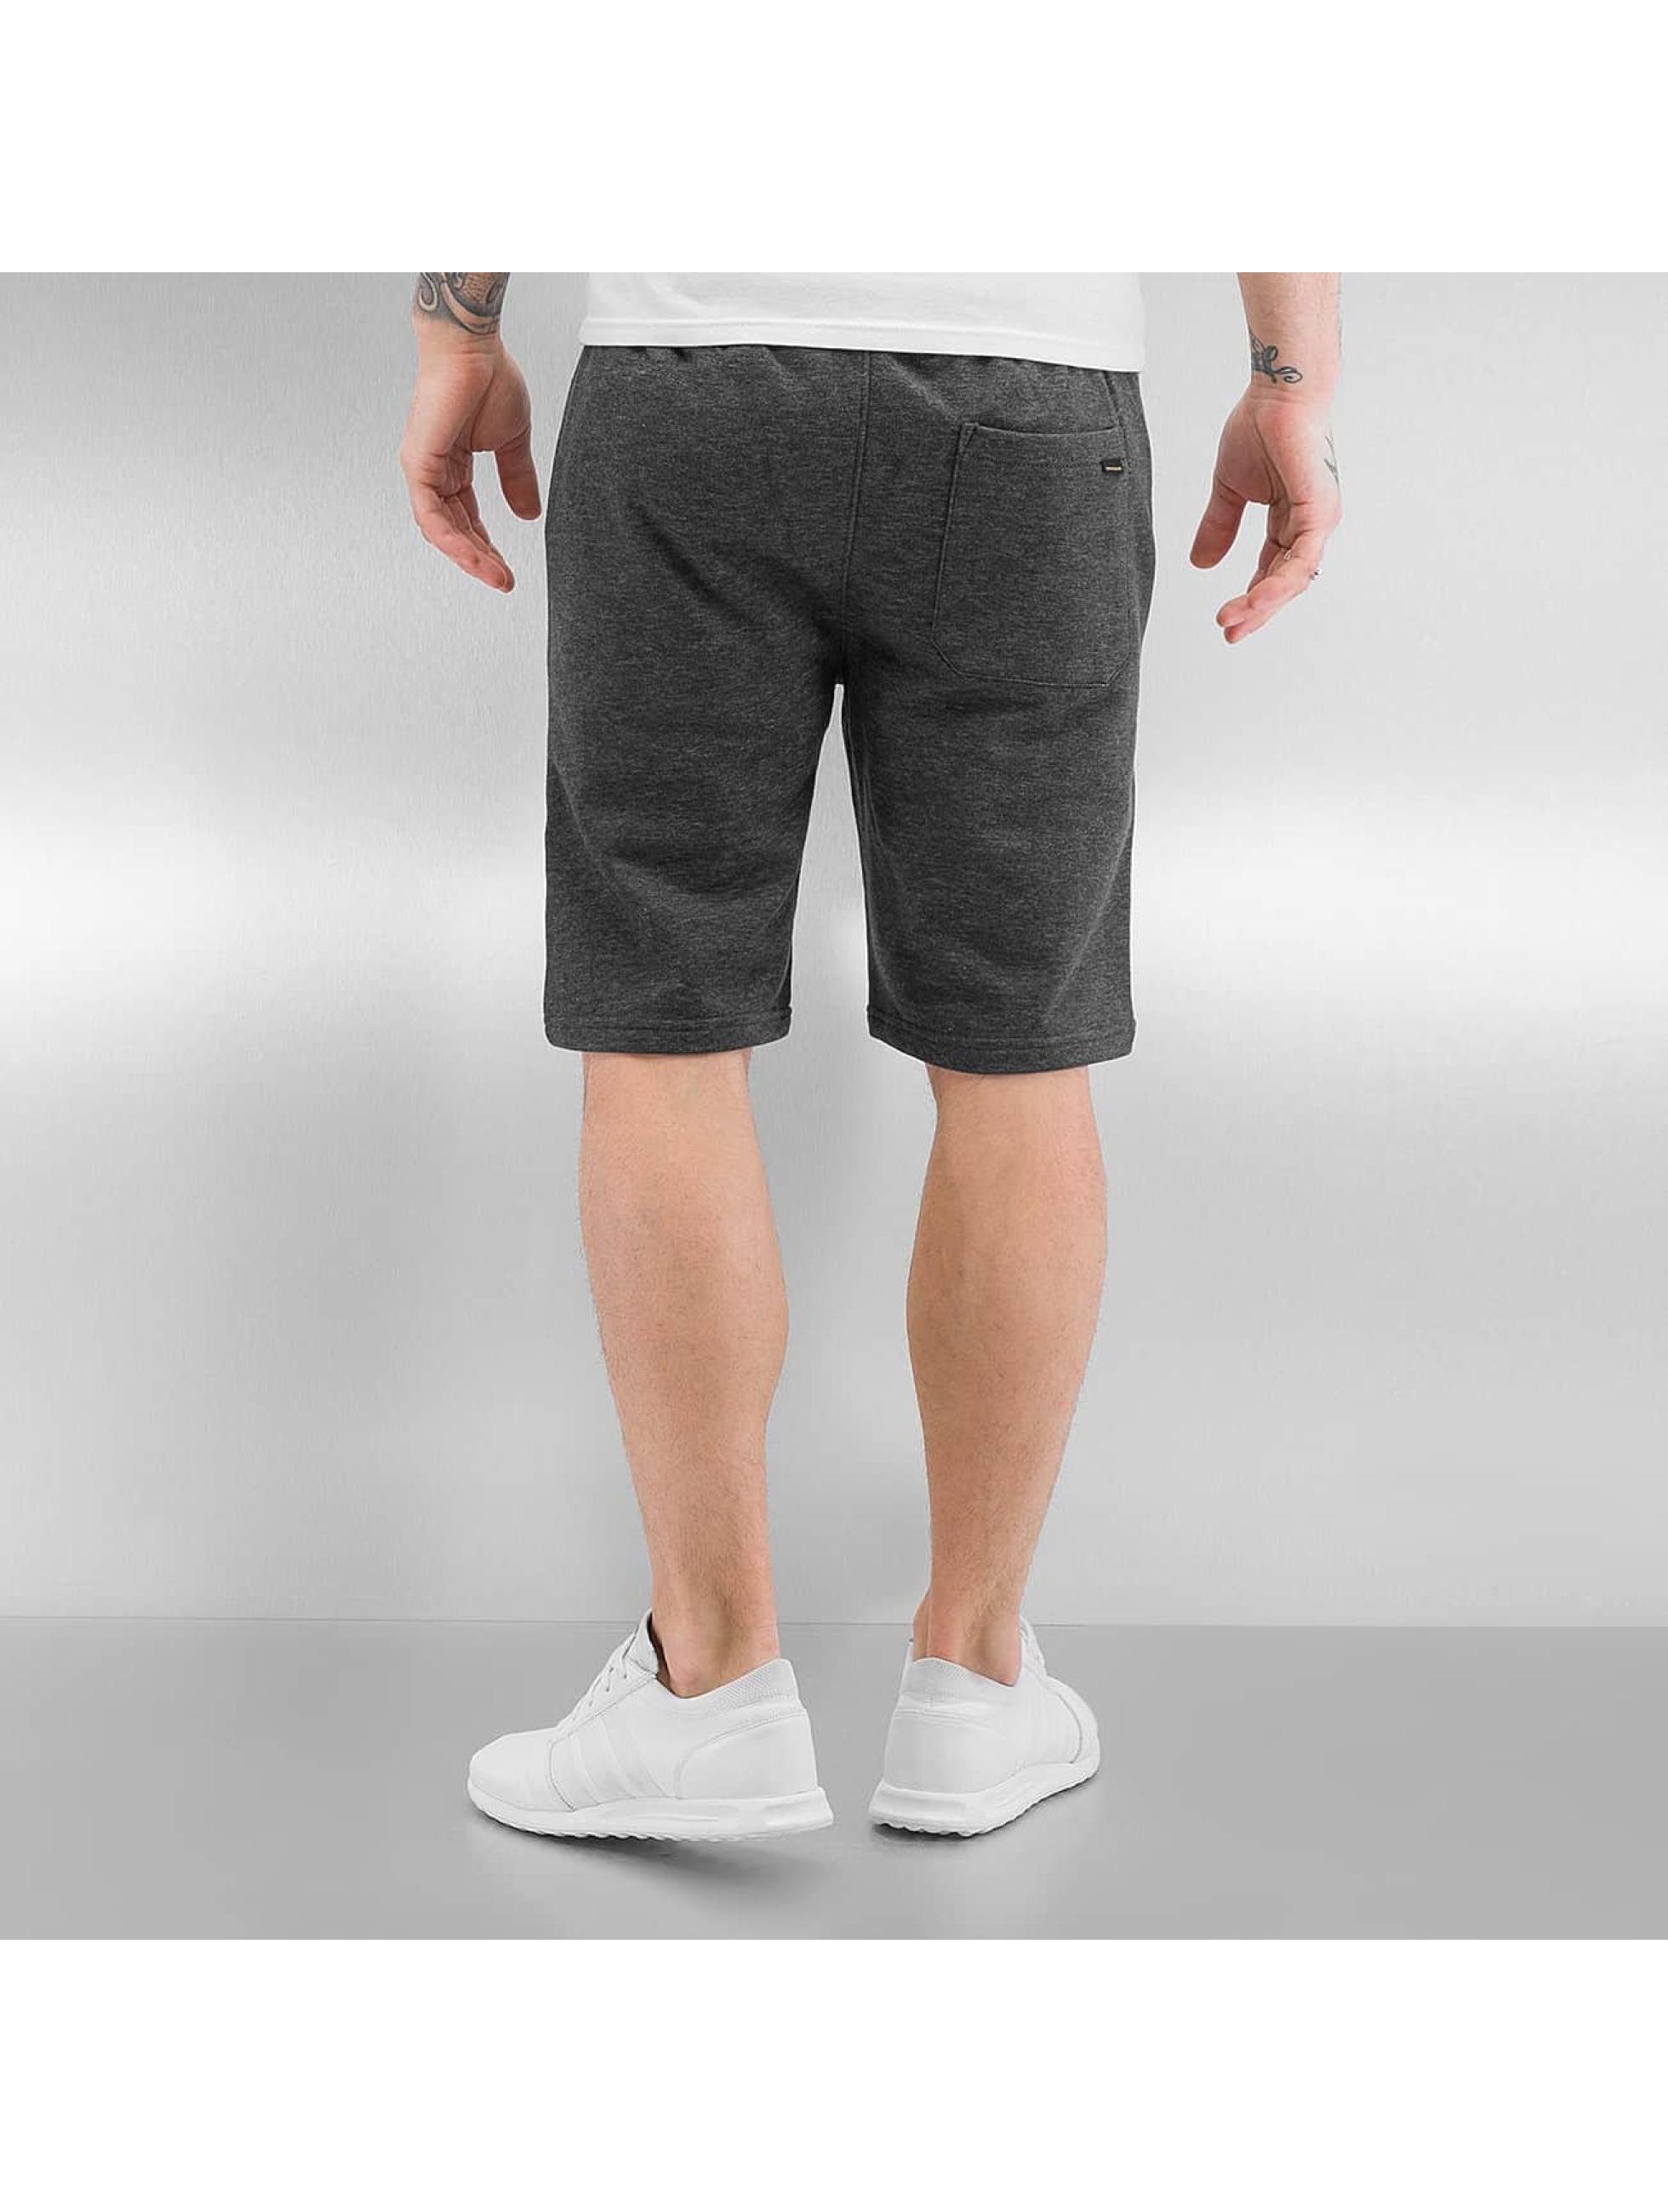 Quiksilver-Uomini-Pantaloni-Shorts-Everyday-grigio-304313-XL